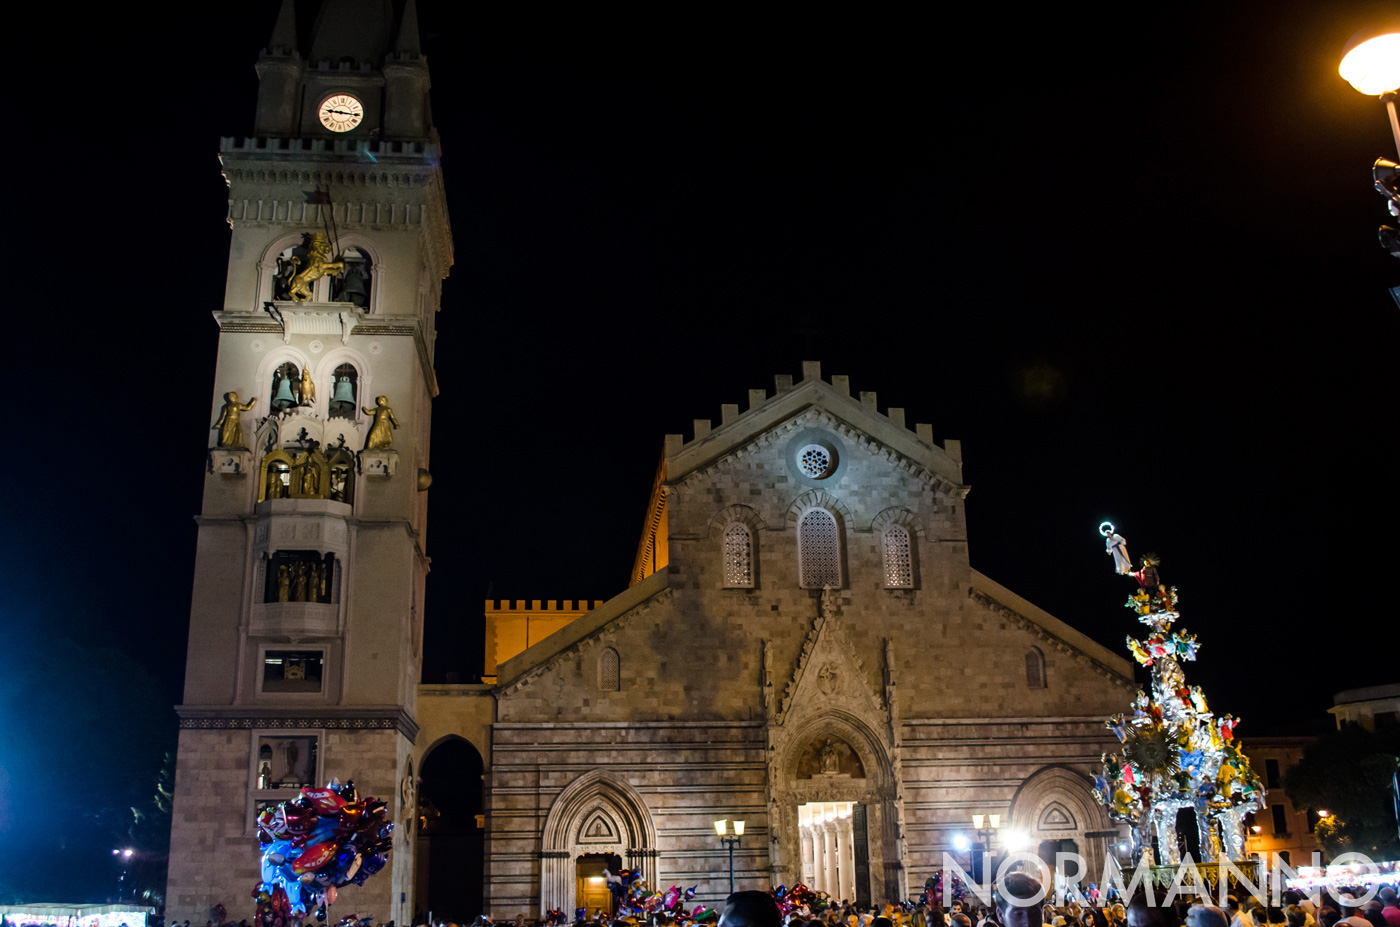 La Vara arriva a piazza Duomo - Messina